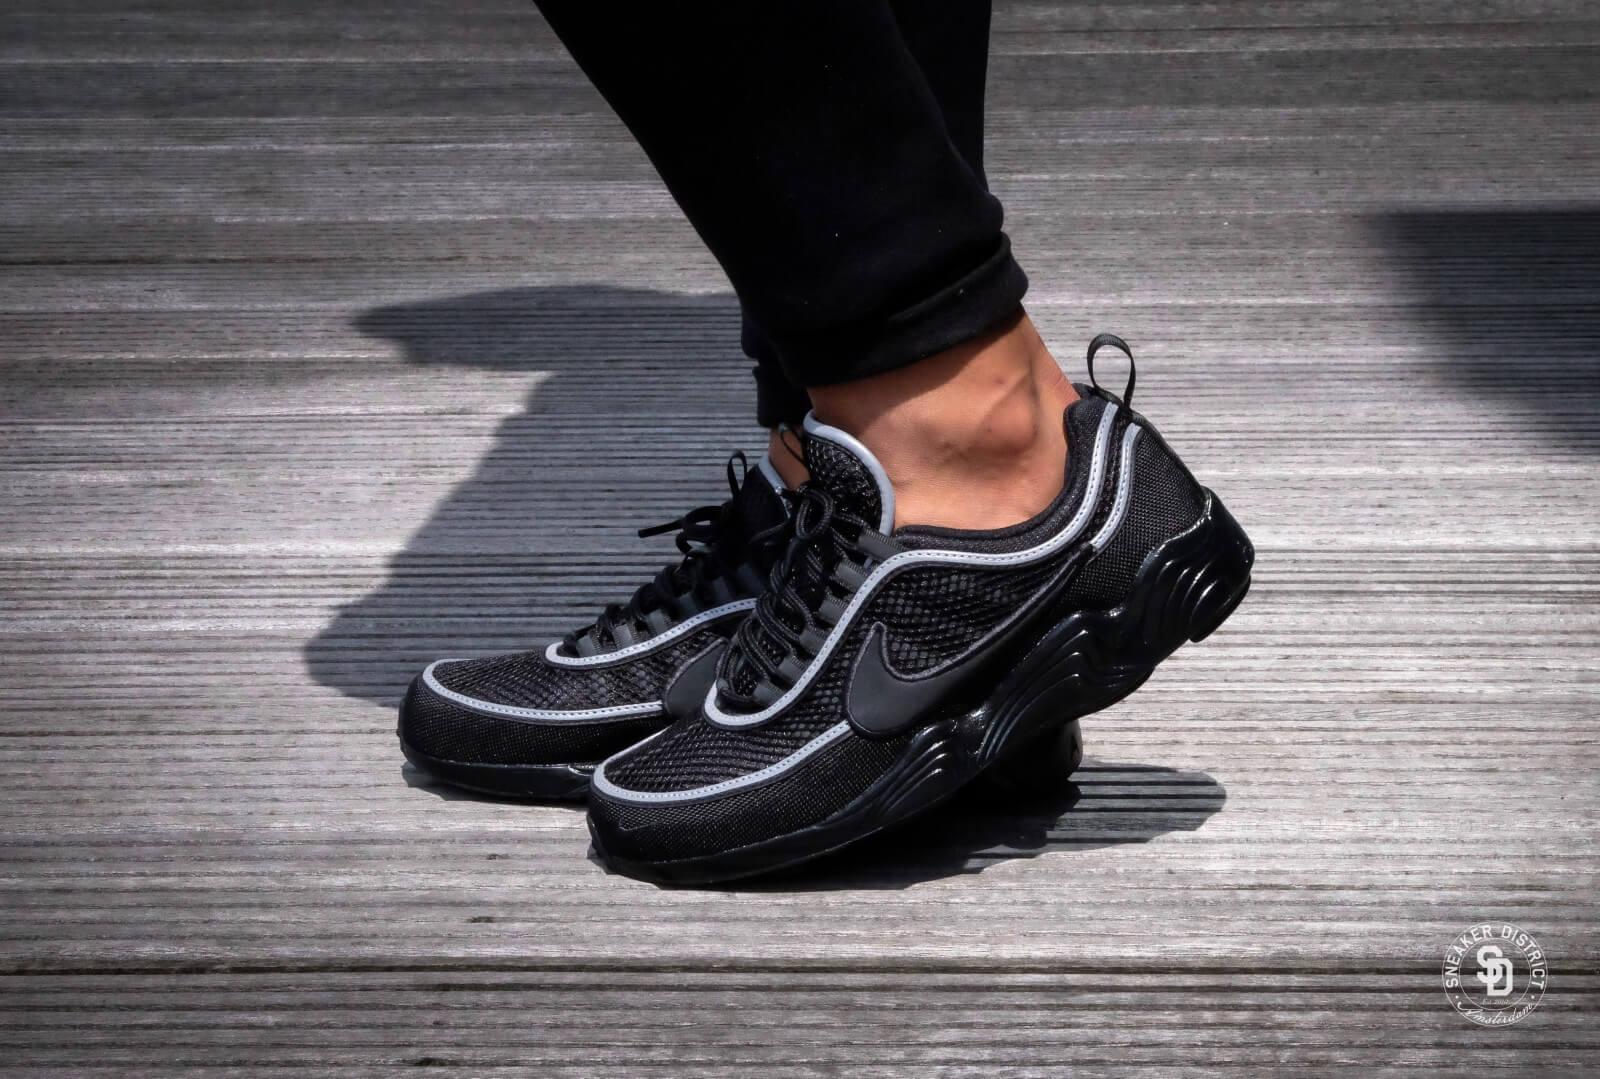 Nike Air Zoom Spiridon '16 Black